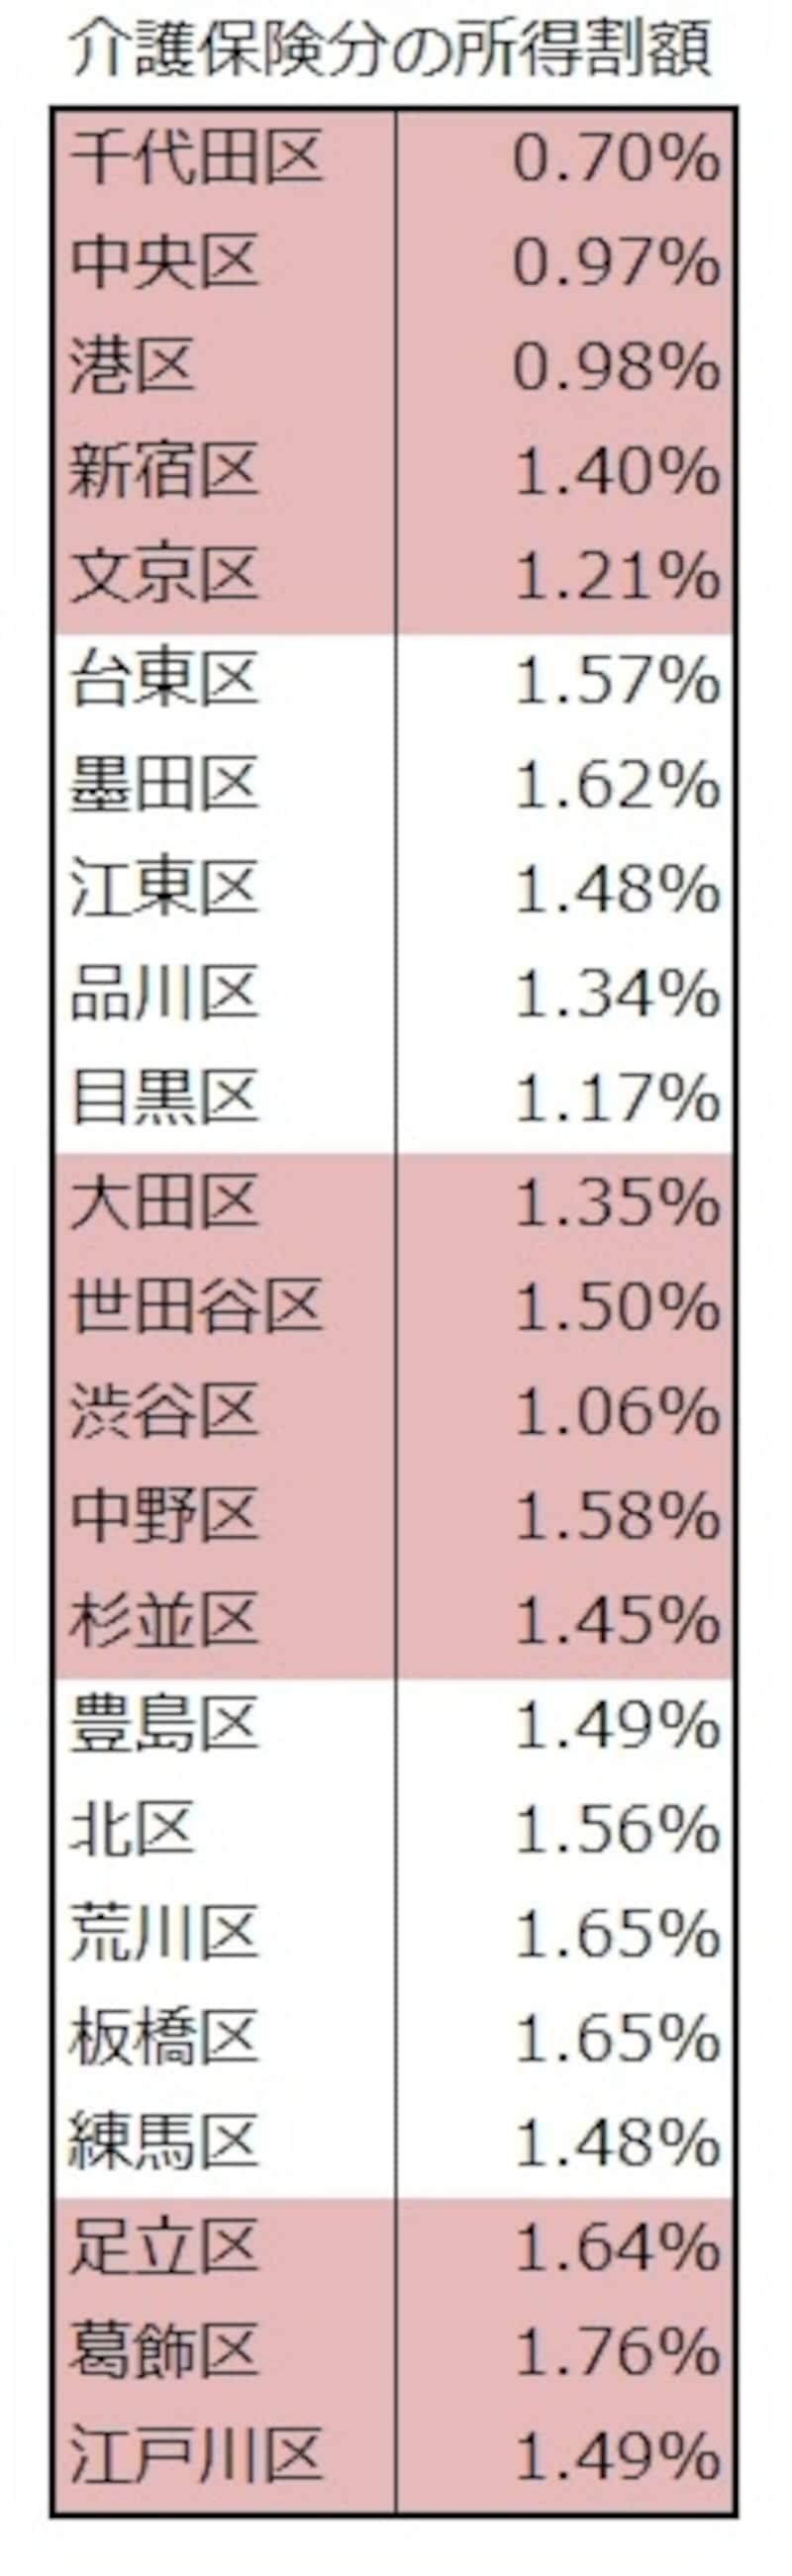 各区の介護分の所得割料率